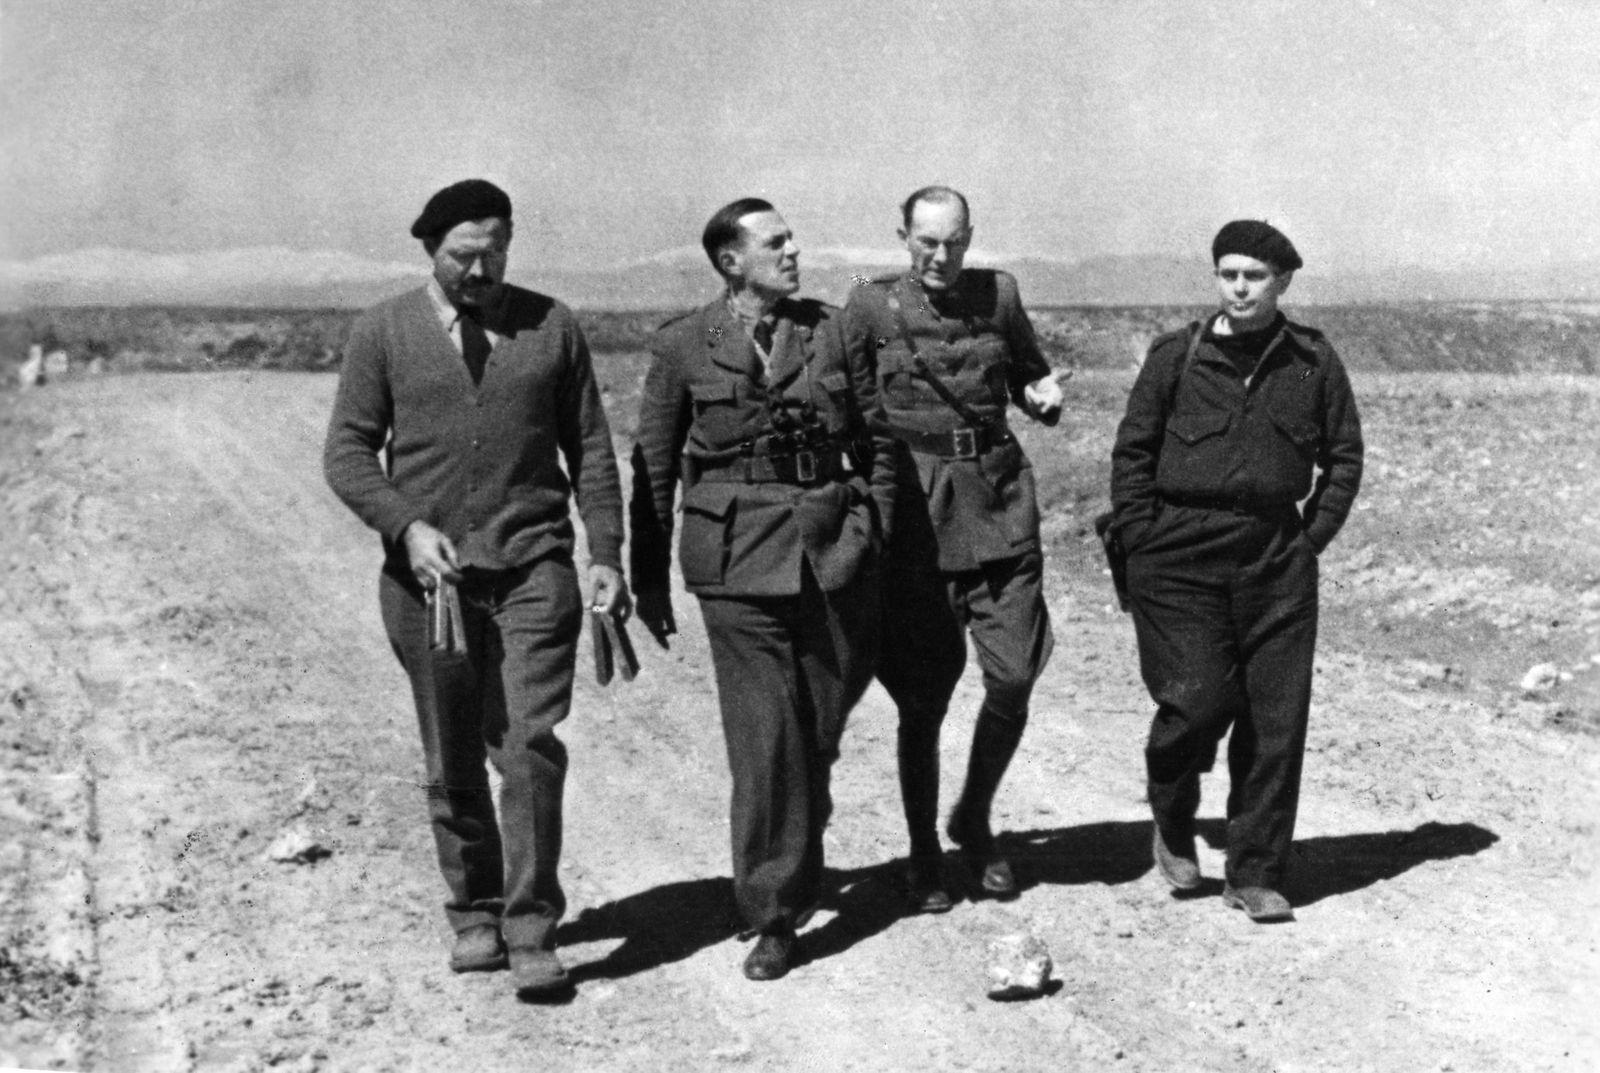 Aug 14 2014 Ernest Hemingway L and Joris Ivens R on set of the Propaganda Film The Spanish Ea